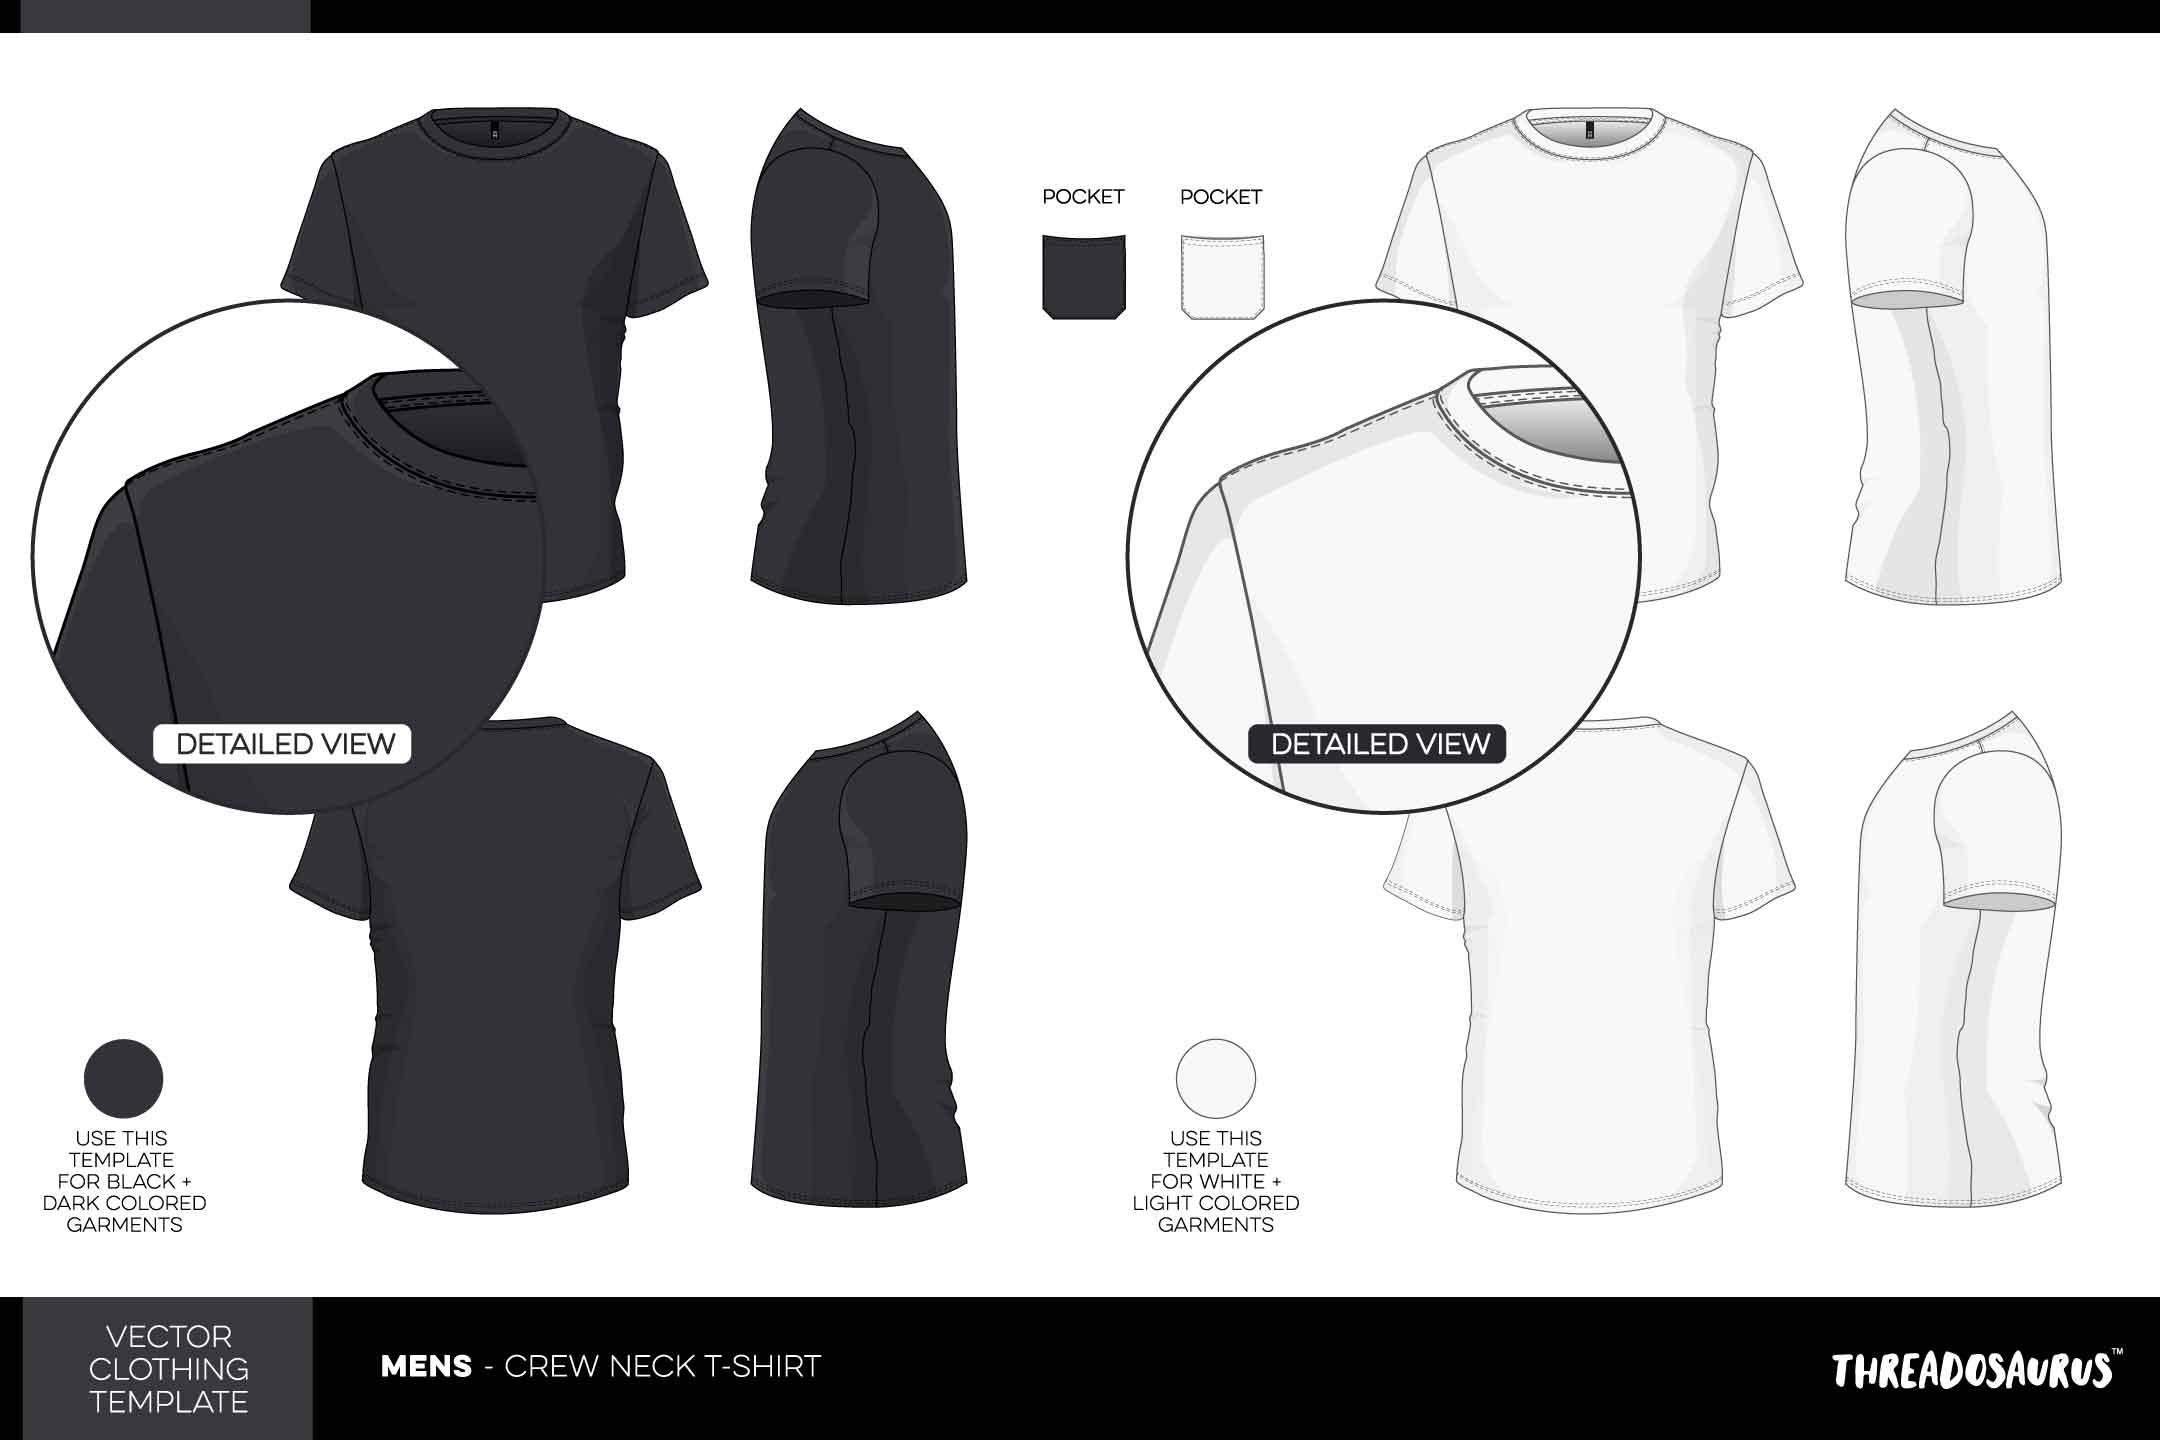 2160x1440 Mens Crew Neck T Shirt Template